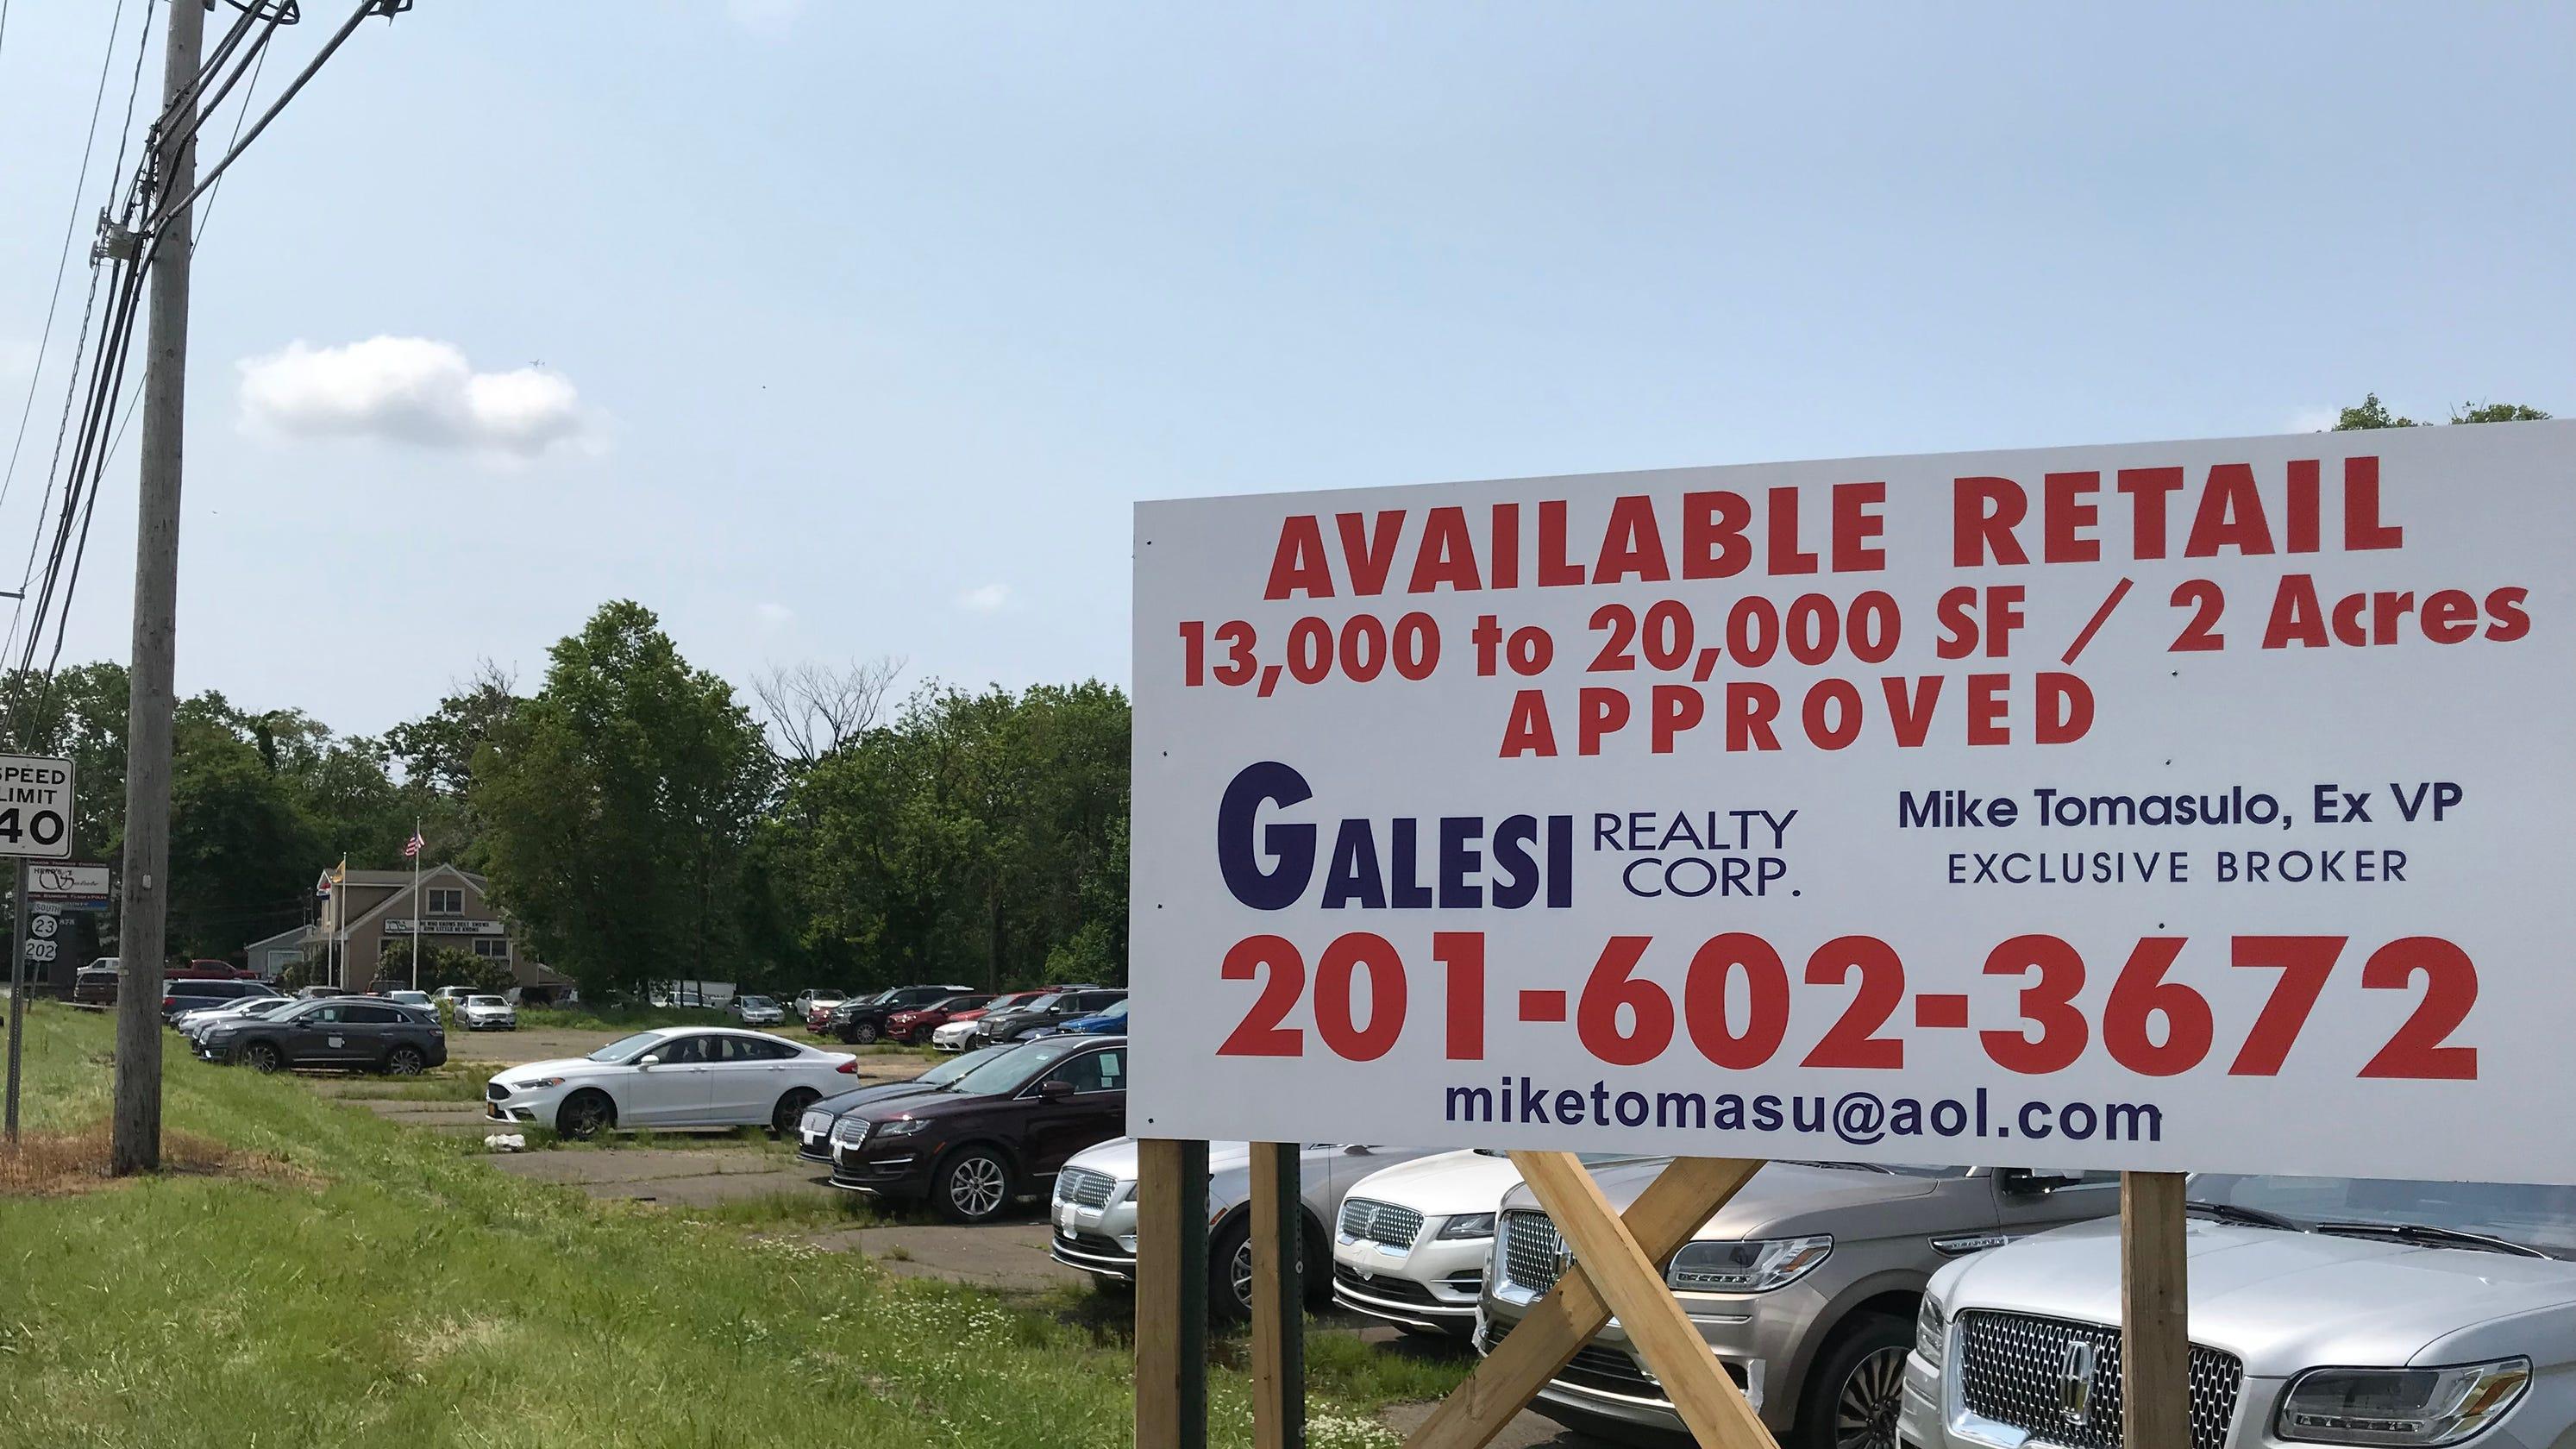 Judge OKs Wayne NJ plan for Trader Joe's, housing on Route 23